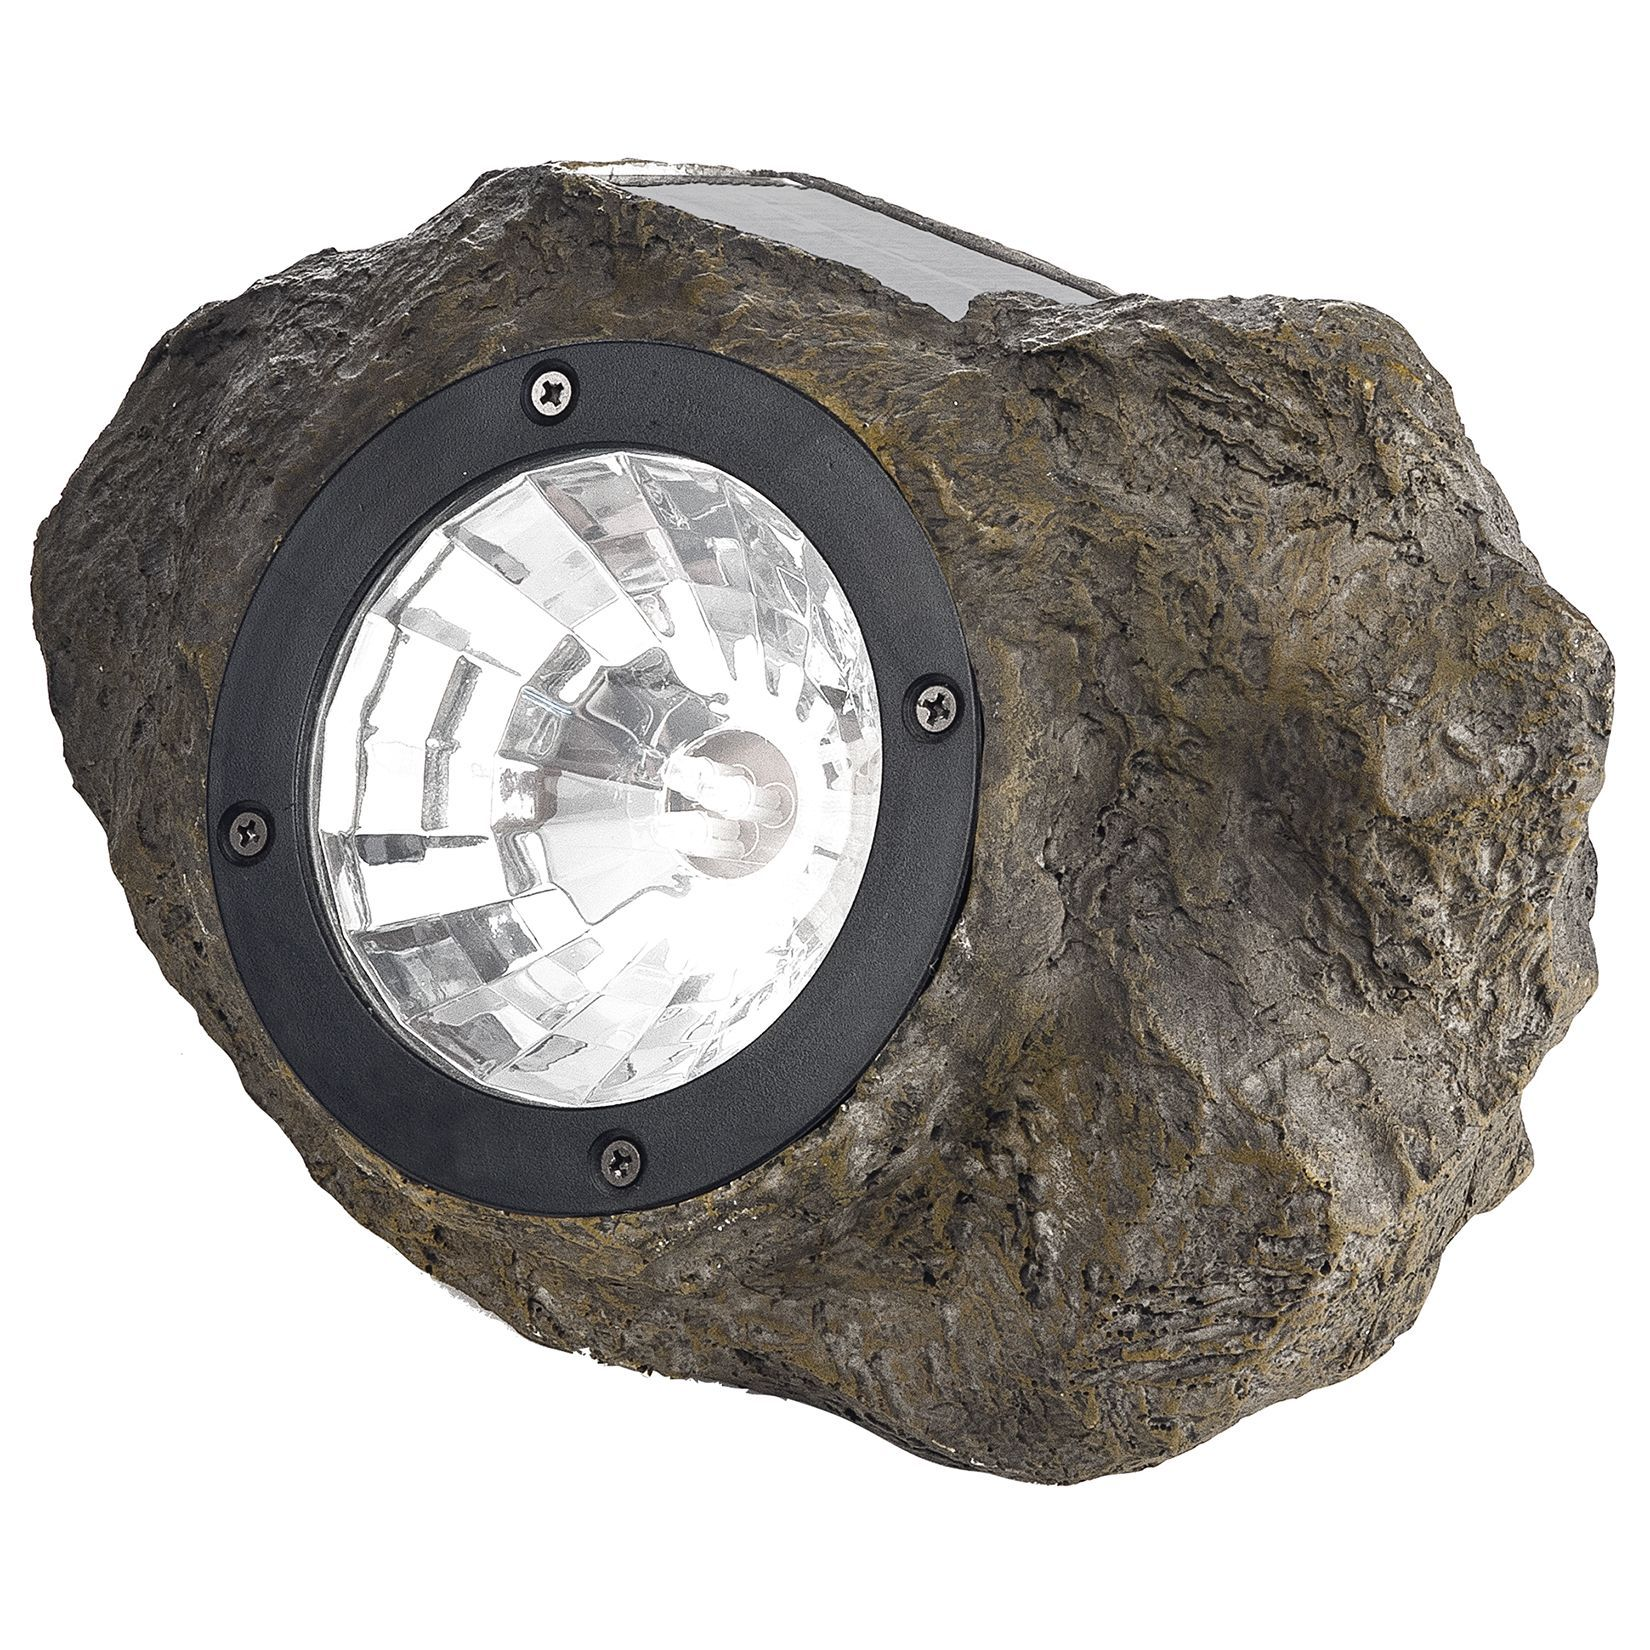 Paradise gl28560st 472 w x 827 l x 472 h plastic solar rock paradise 472 w x 827 l x 472 h plastic solar rock spot light outdoor lighting multi glass aloadofball Images